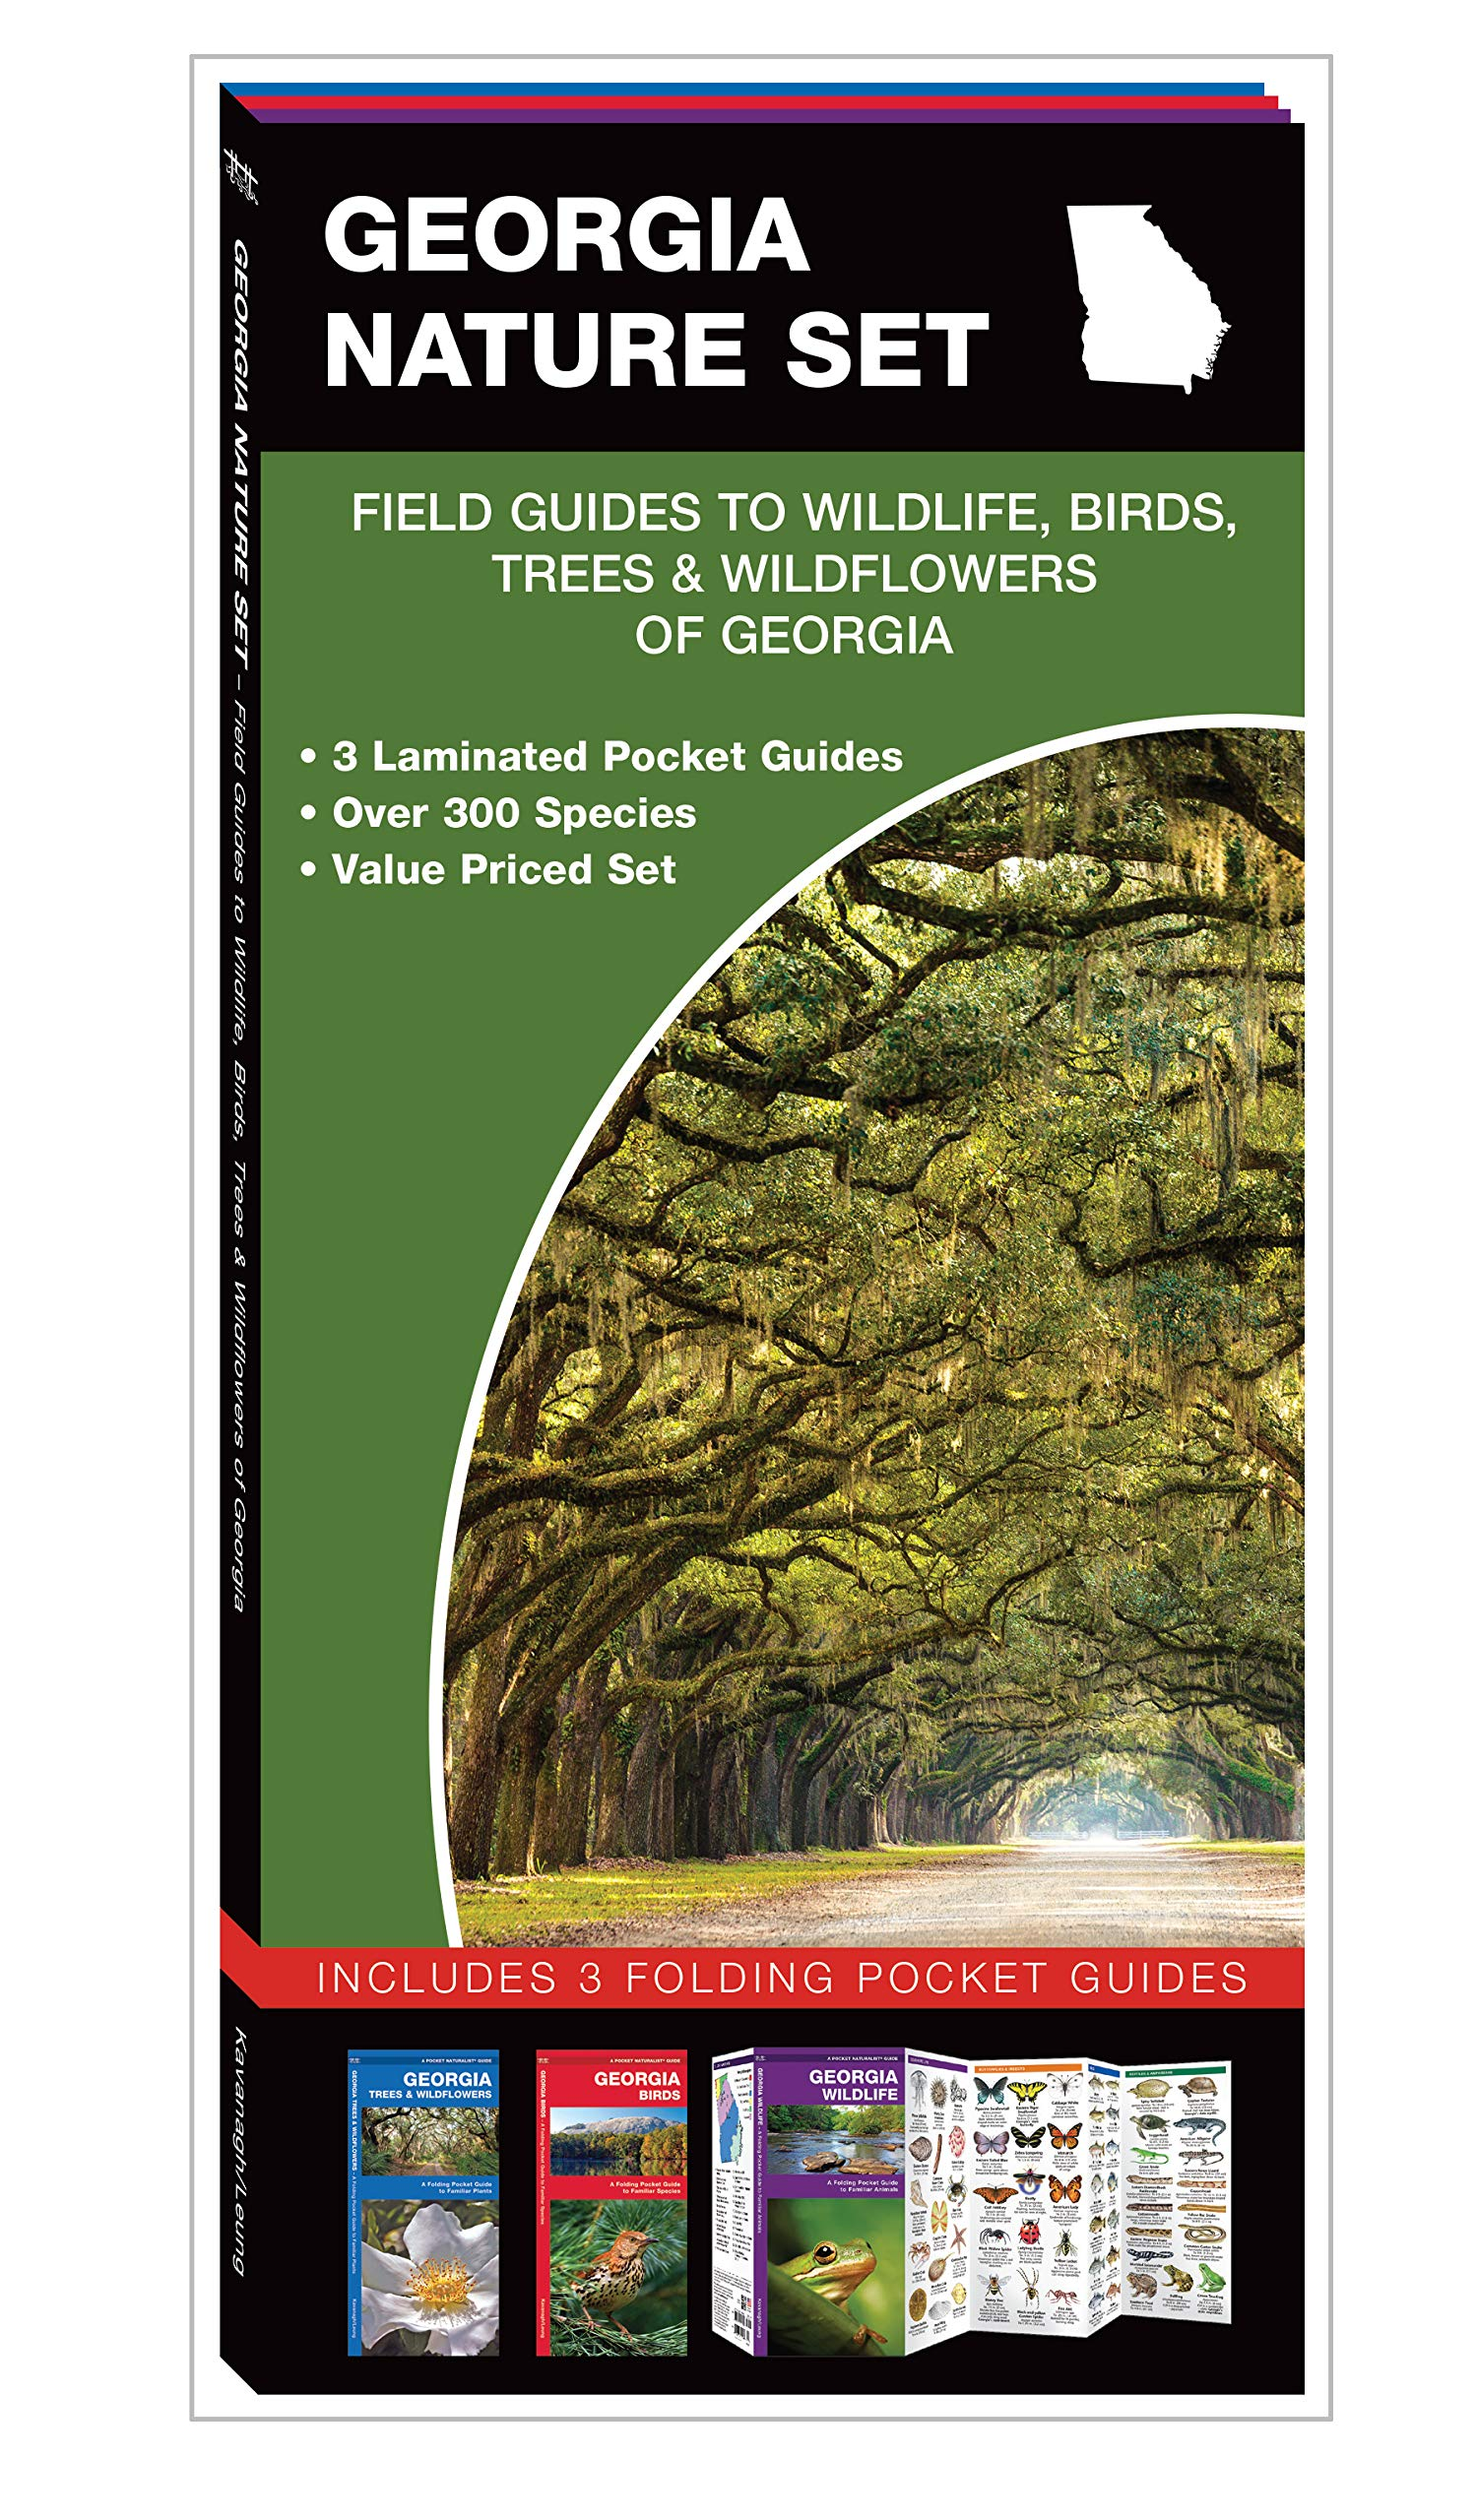 Georgia Nature Set: Field Guides to Wildlife, Birds, Trees & Wildflowers of Georgia ebook